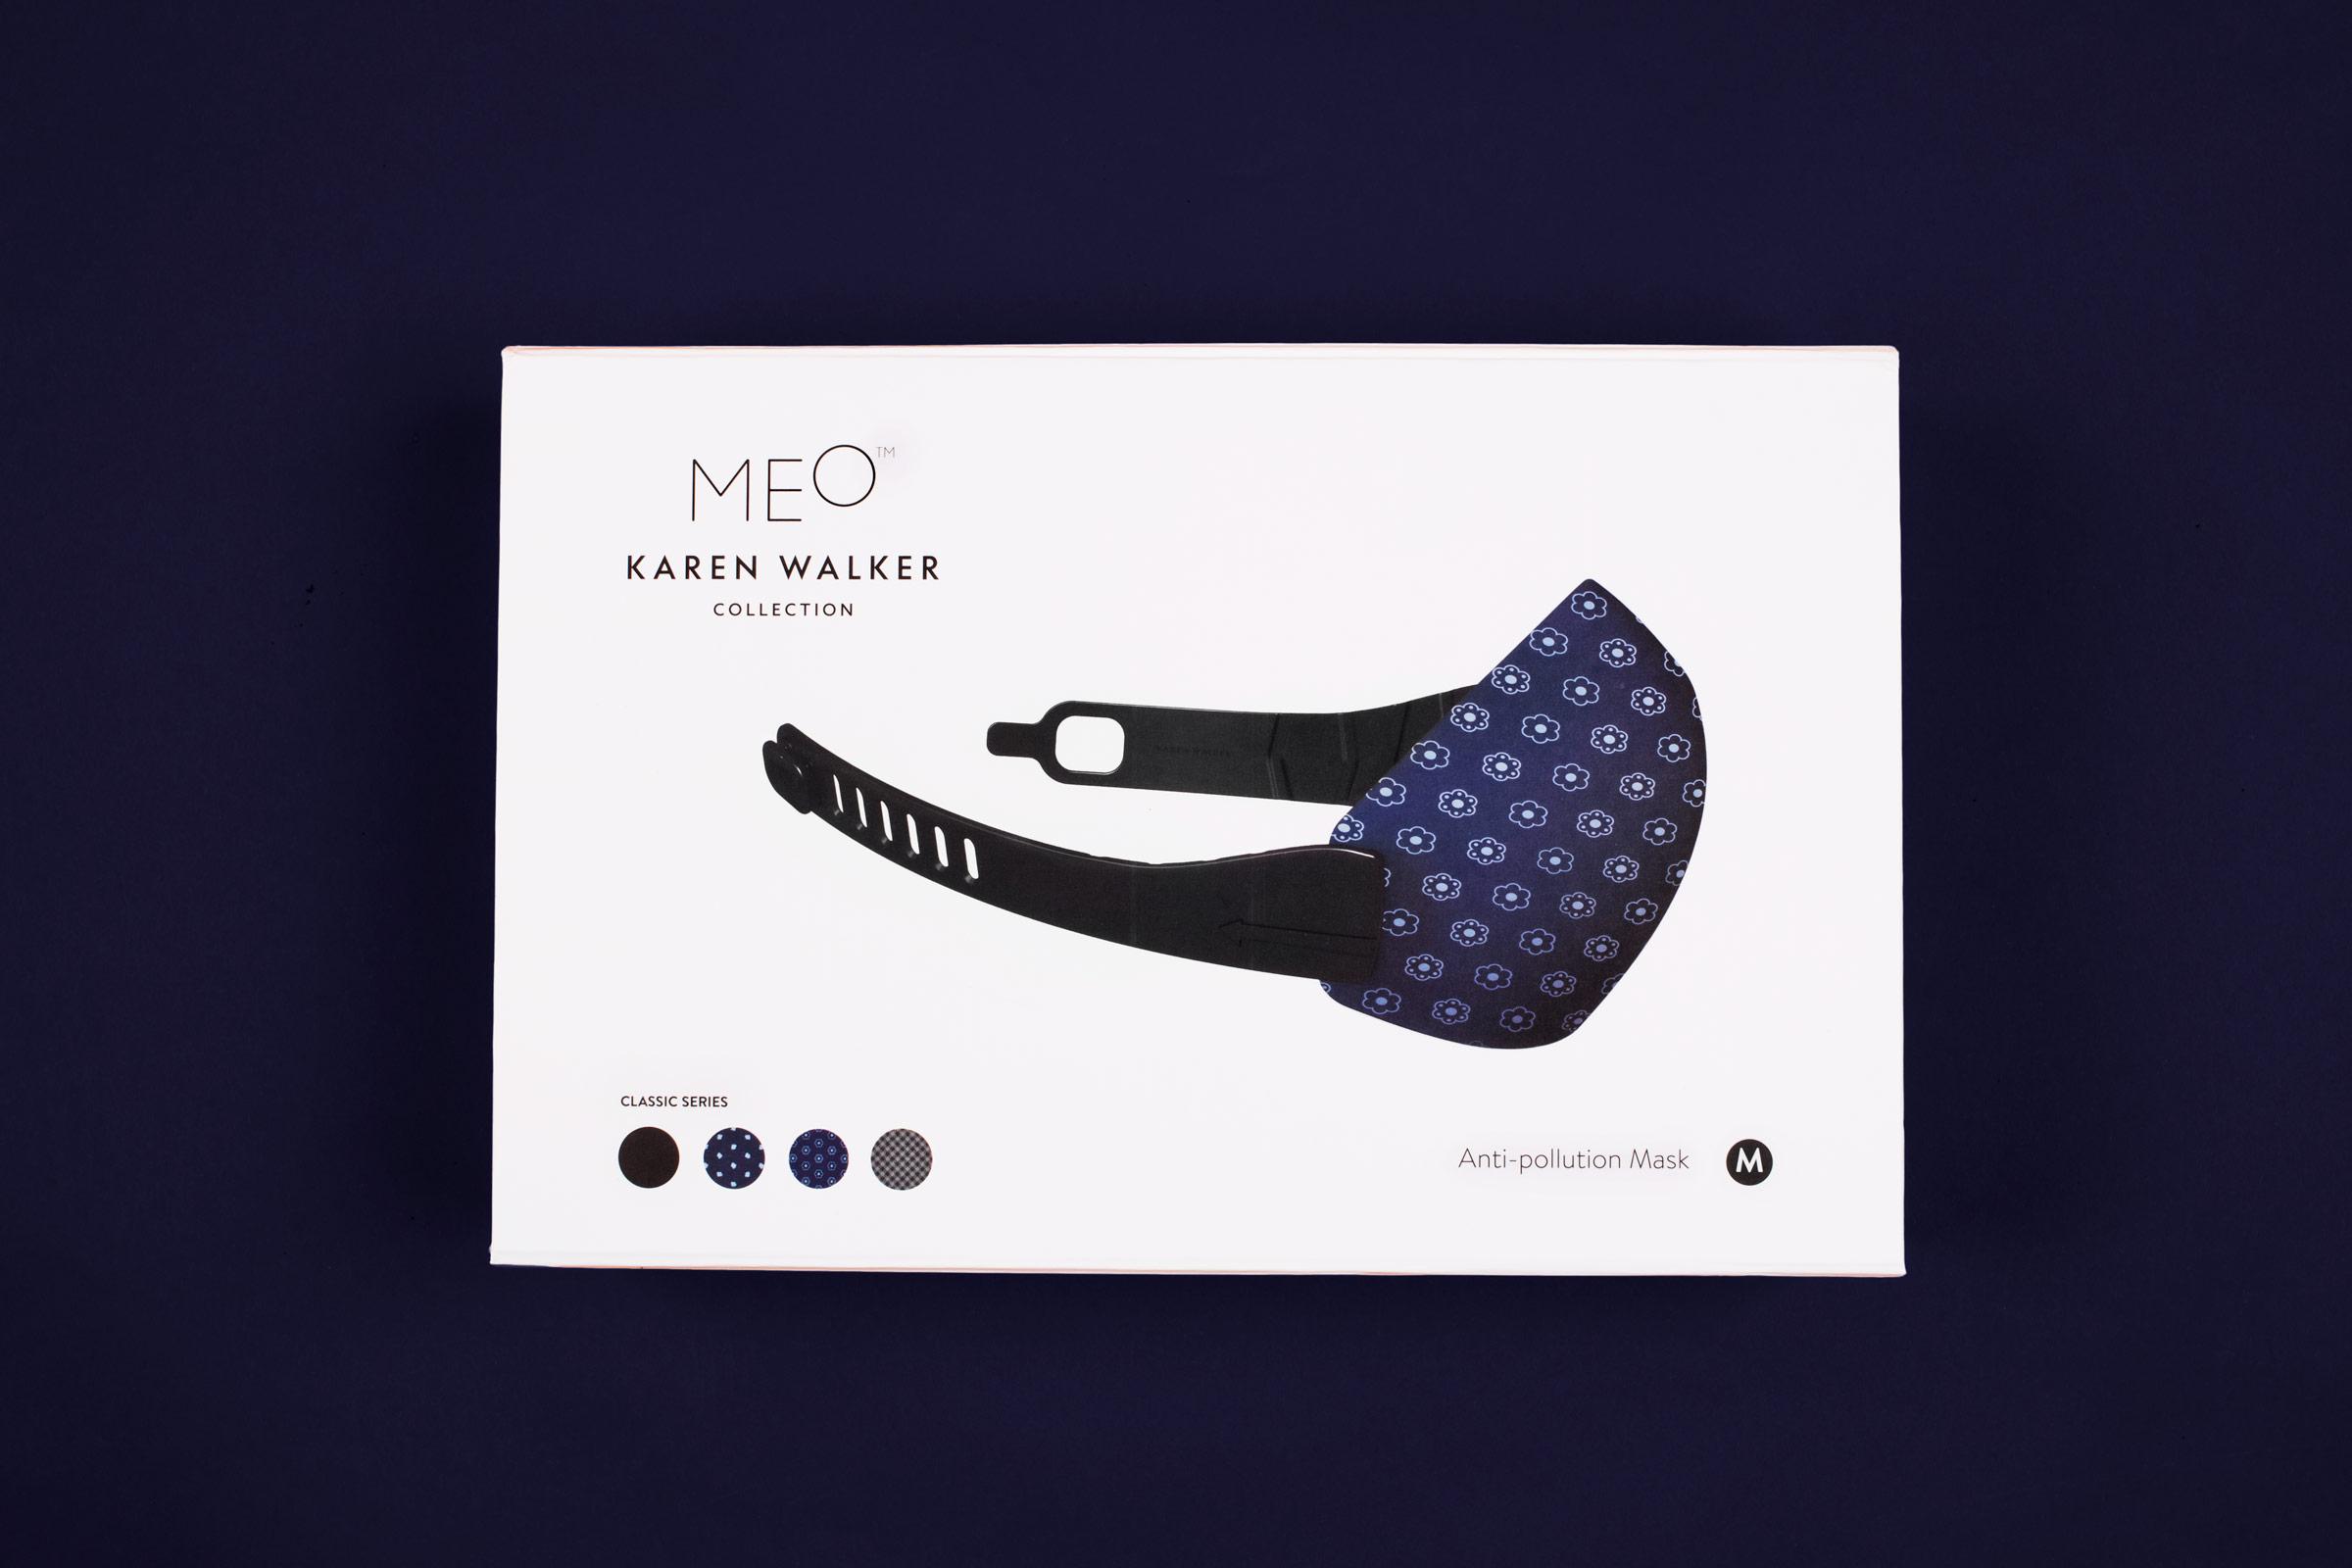 MEO Karen Walker Face Mask Packaging